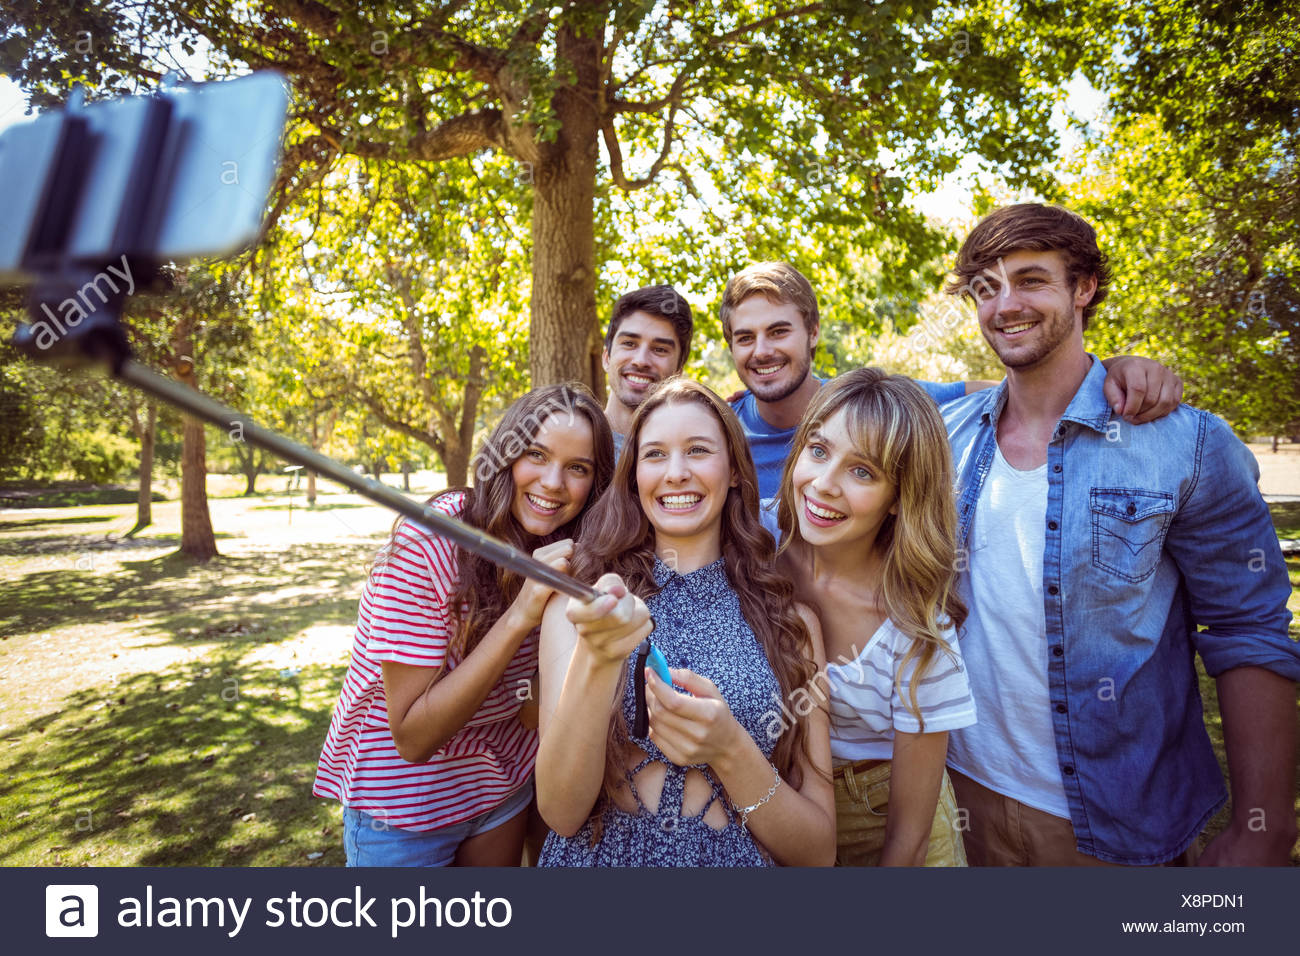 Happy friends in the park taking selfie - Stock Image